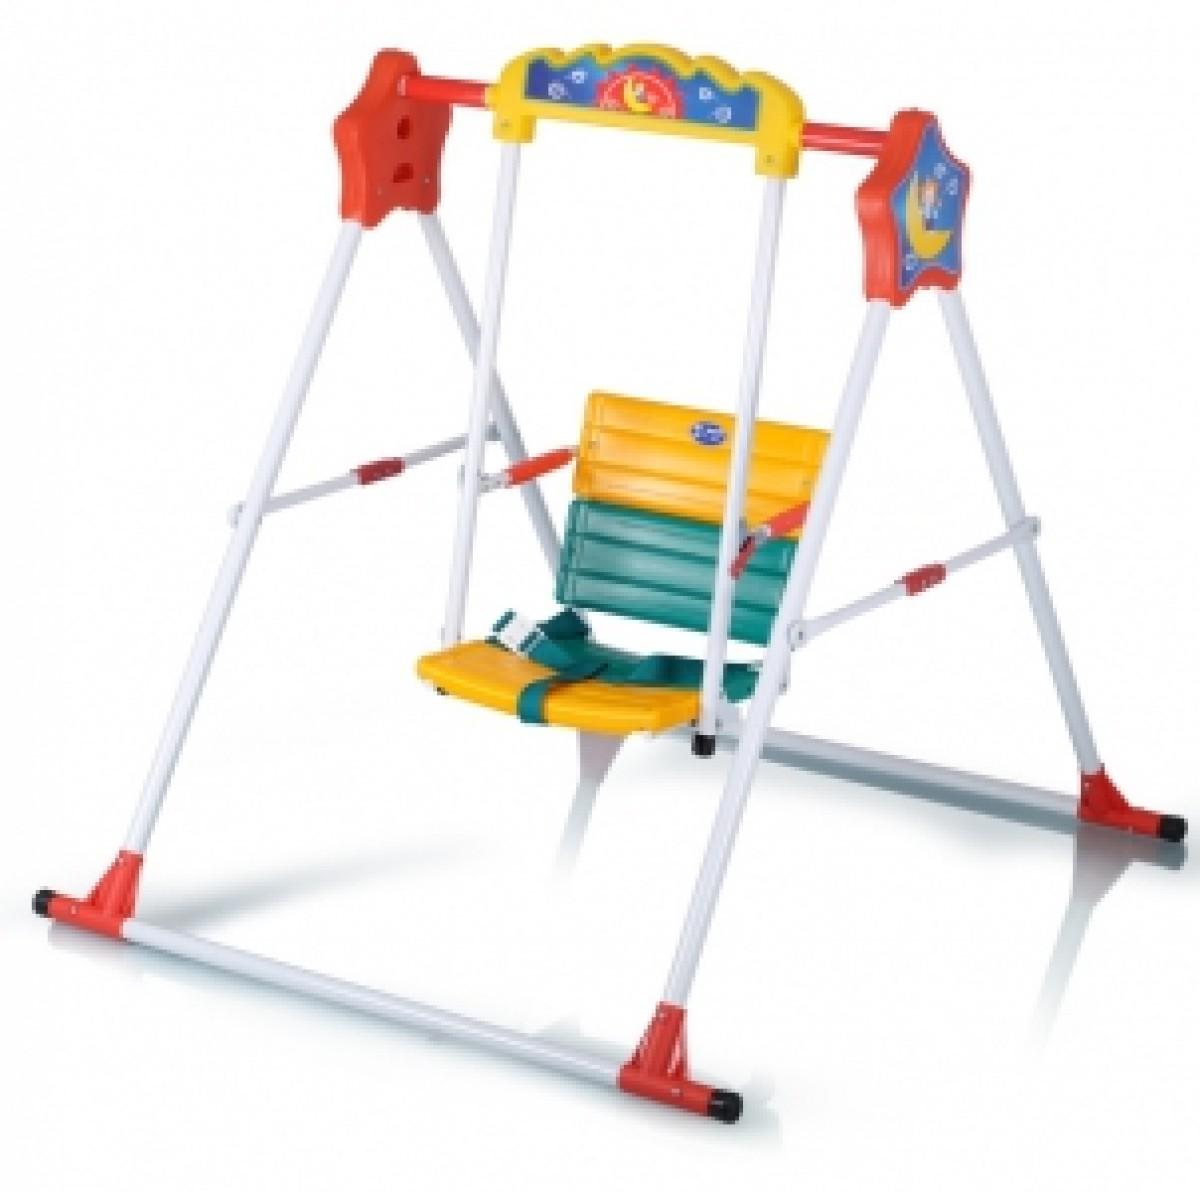 Foldable Slide Playground - Kico Baby Center